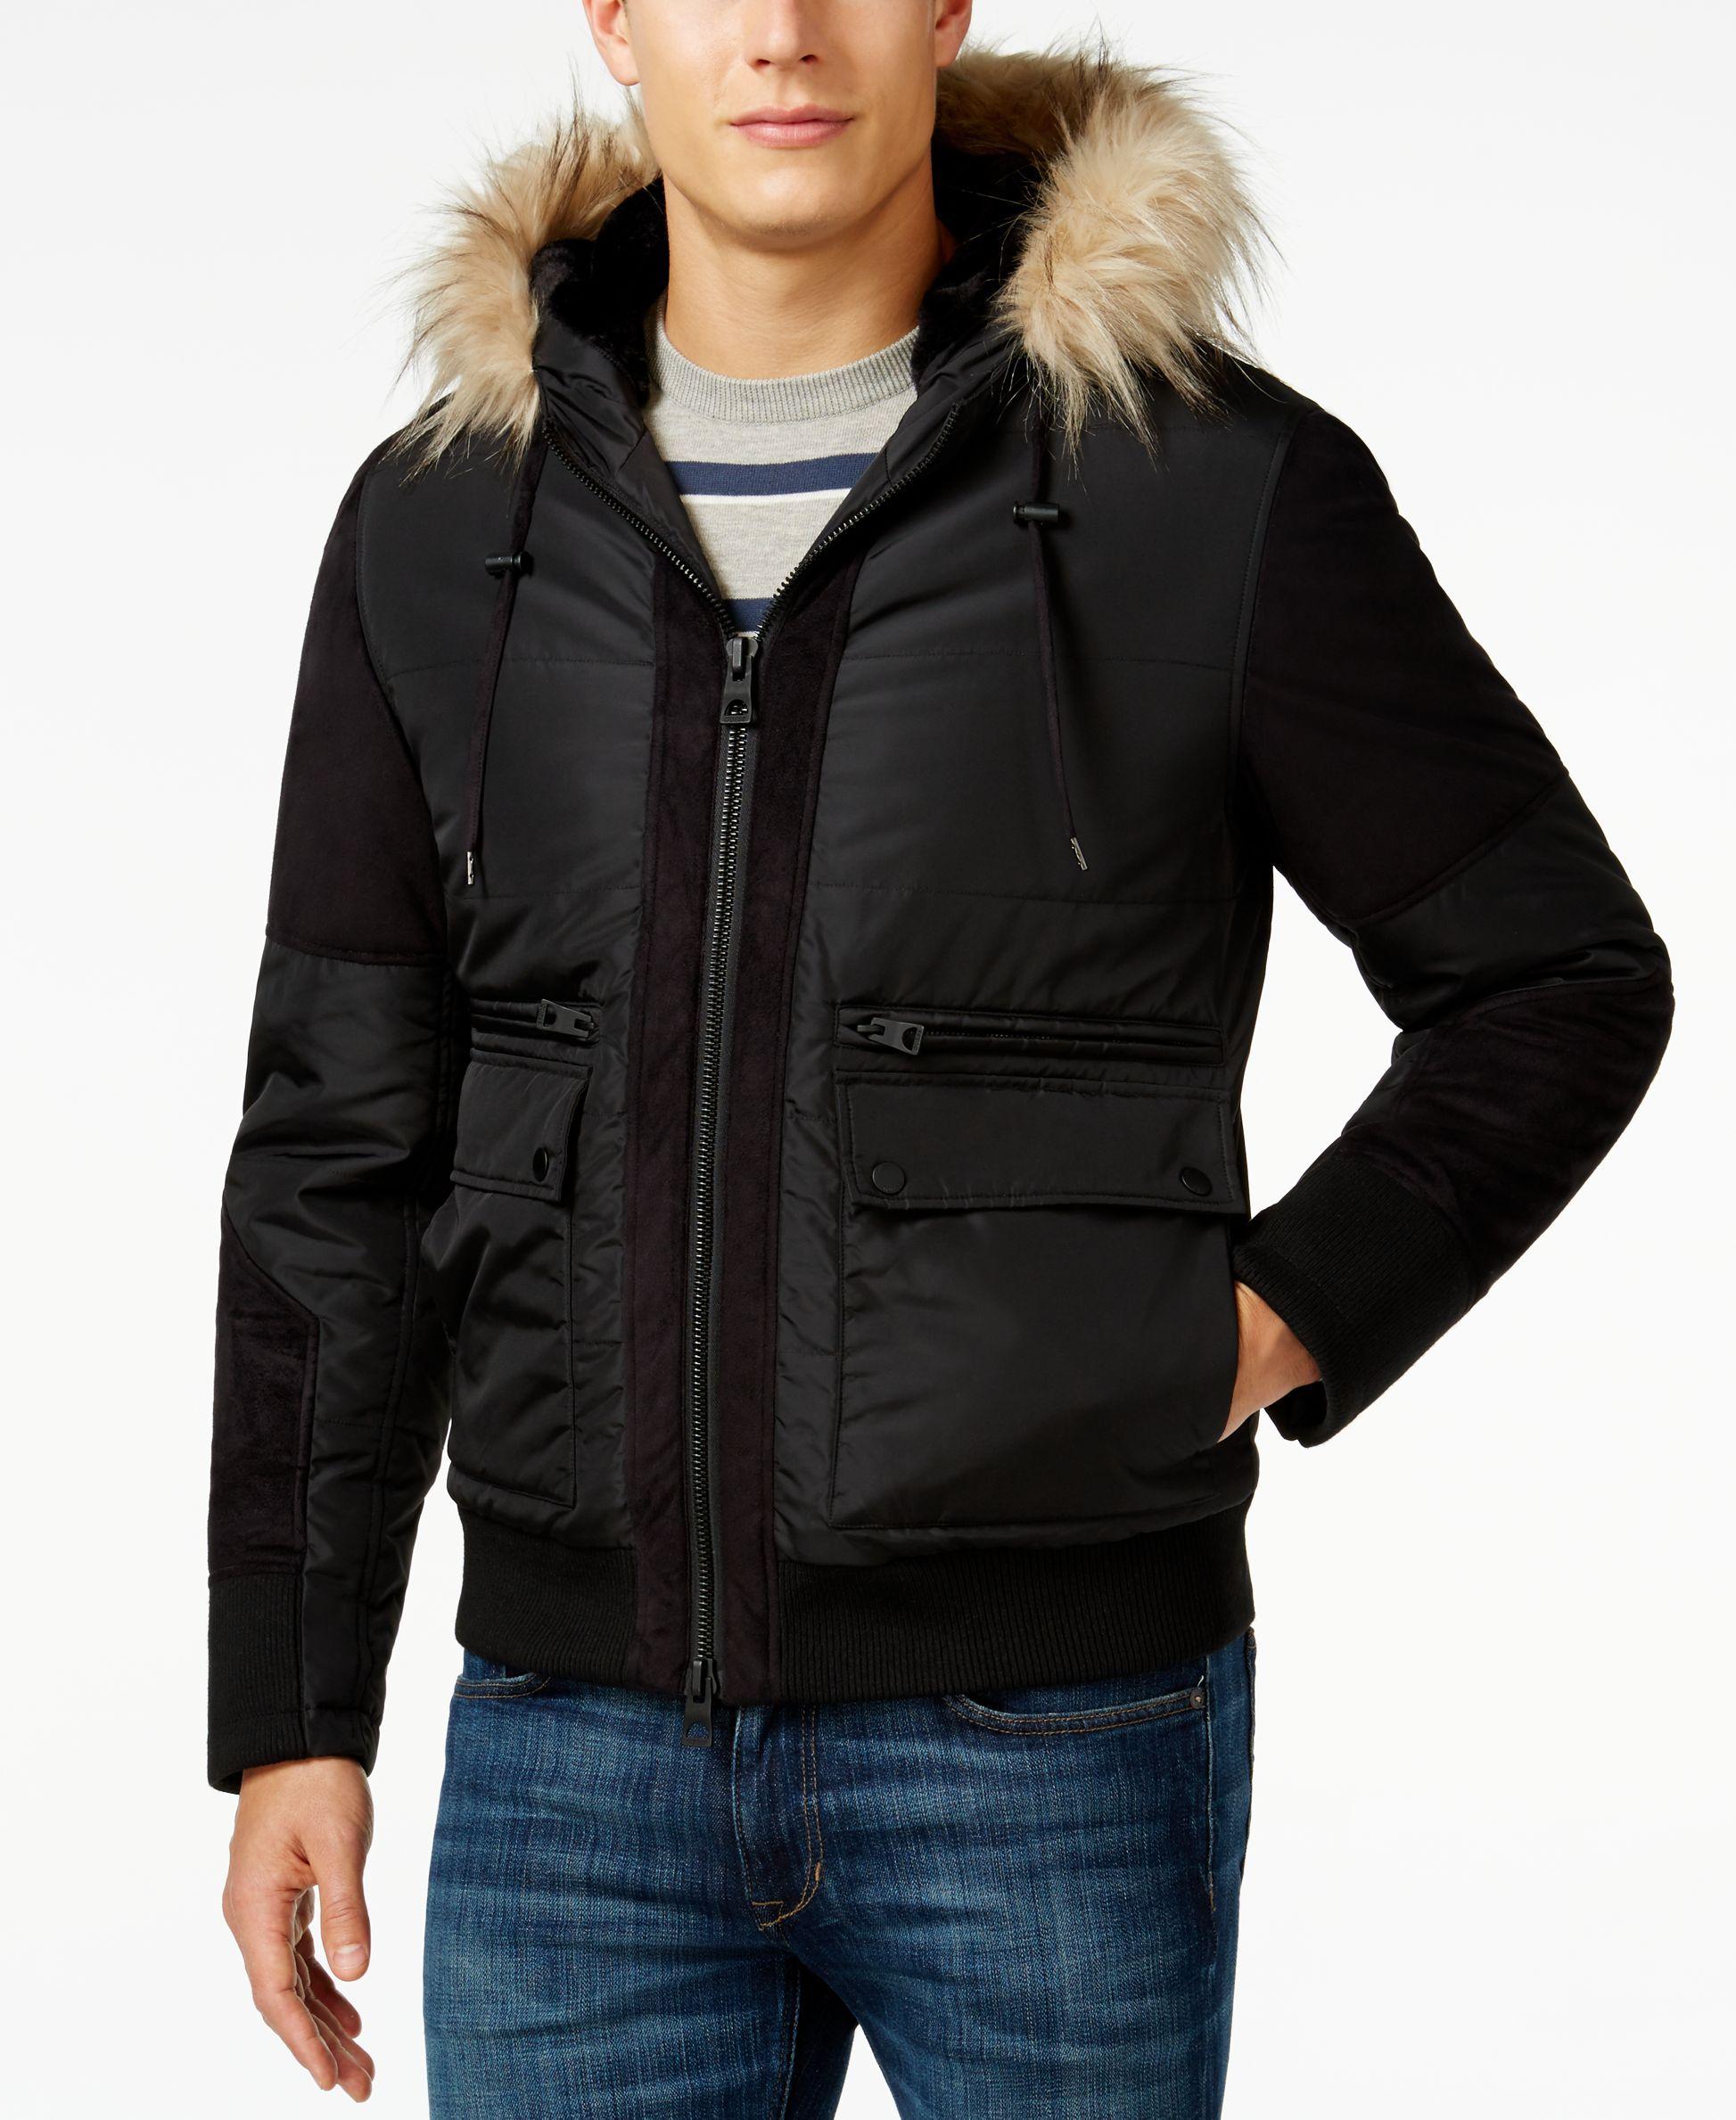 Guess Filmore FauxFur Hood Puffer Jacket Faux fur hood